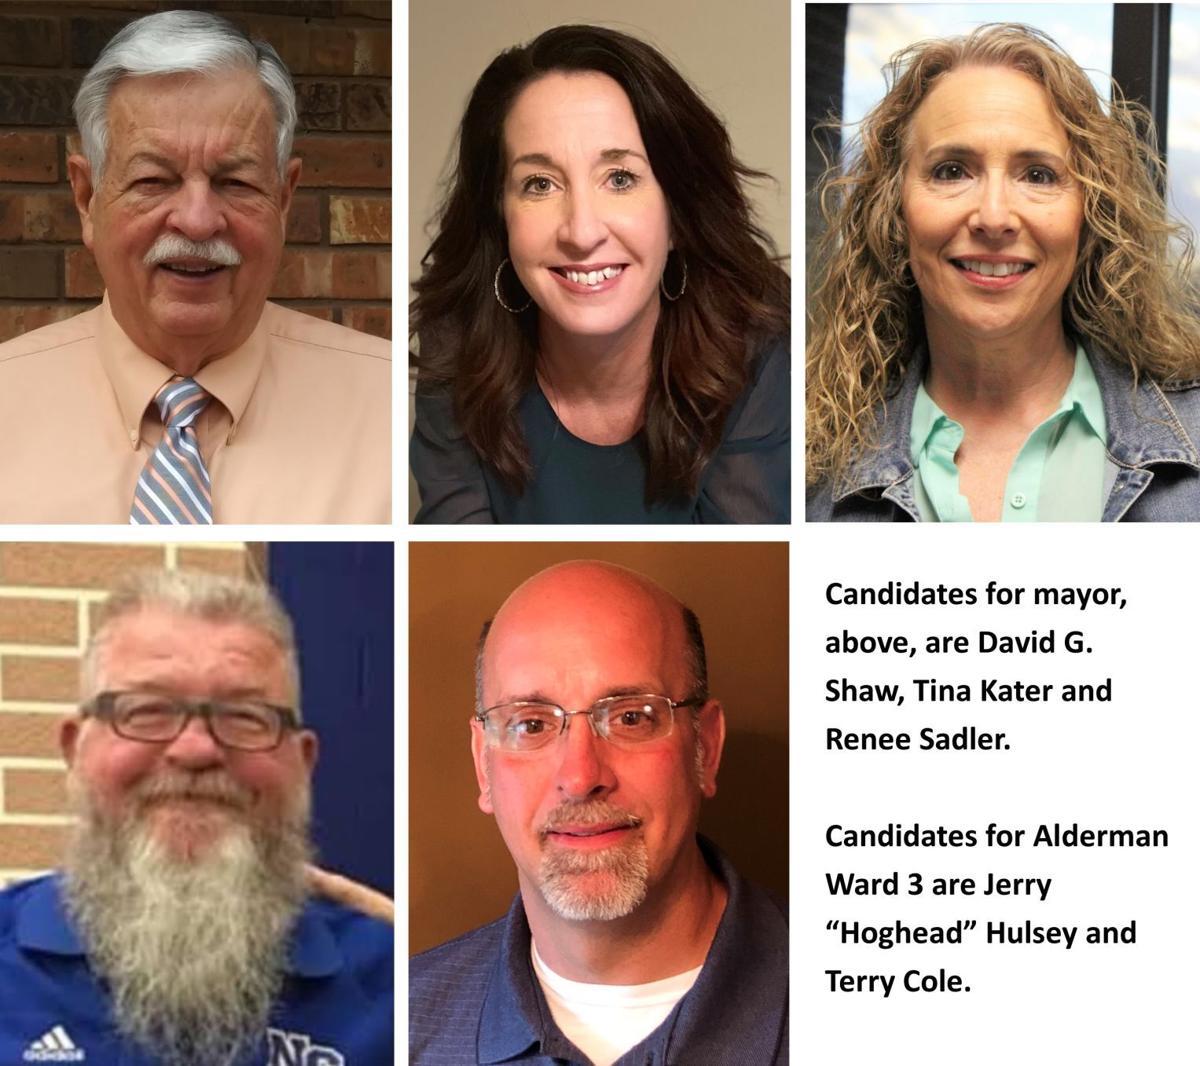 In Desloge, 3 vie for mayor, 2 for Ward 3 alderman